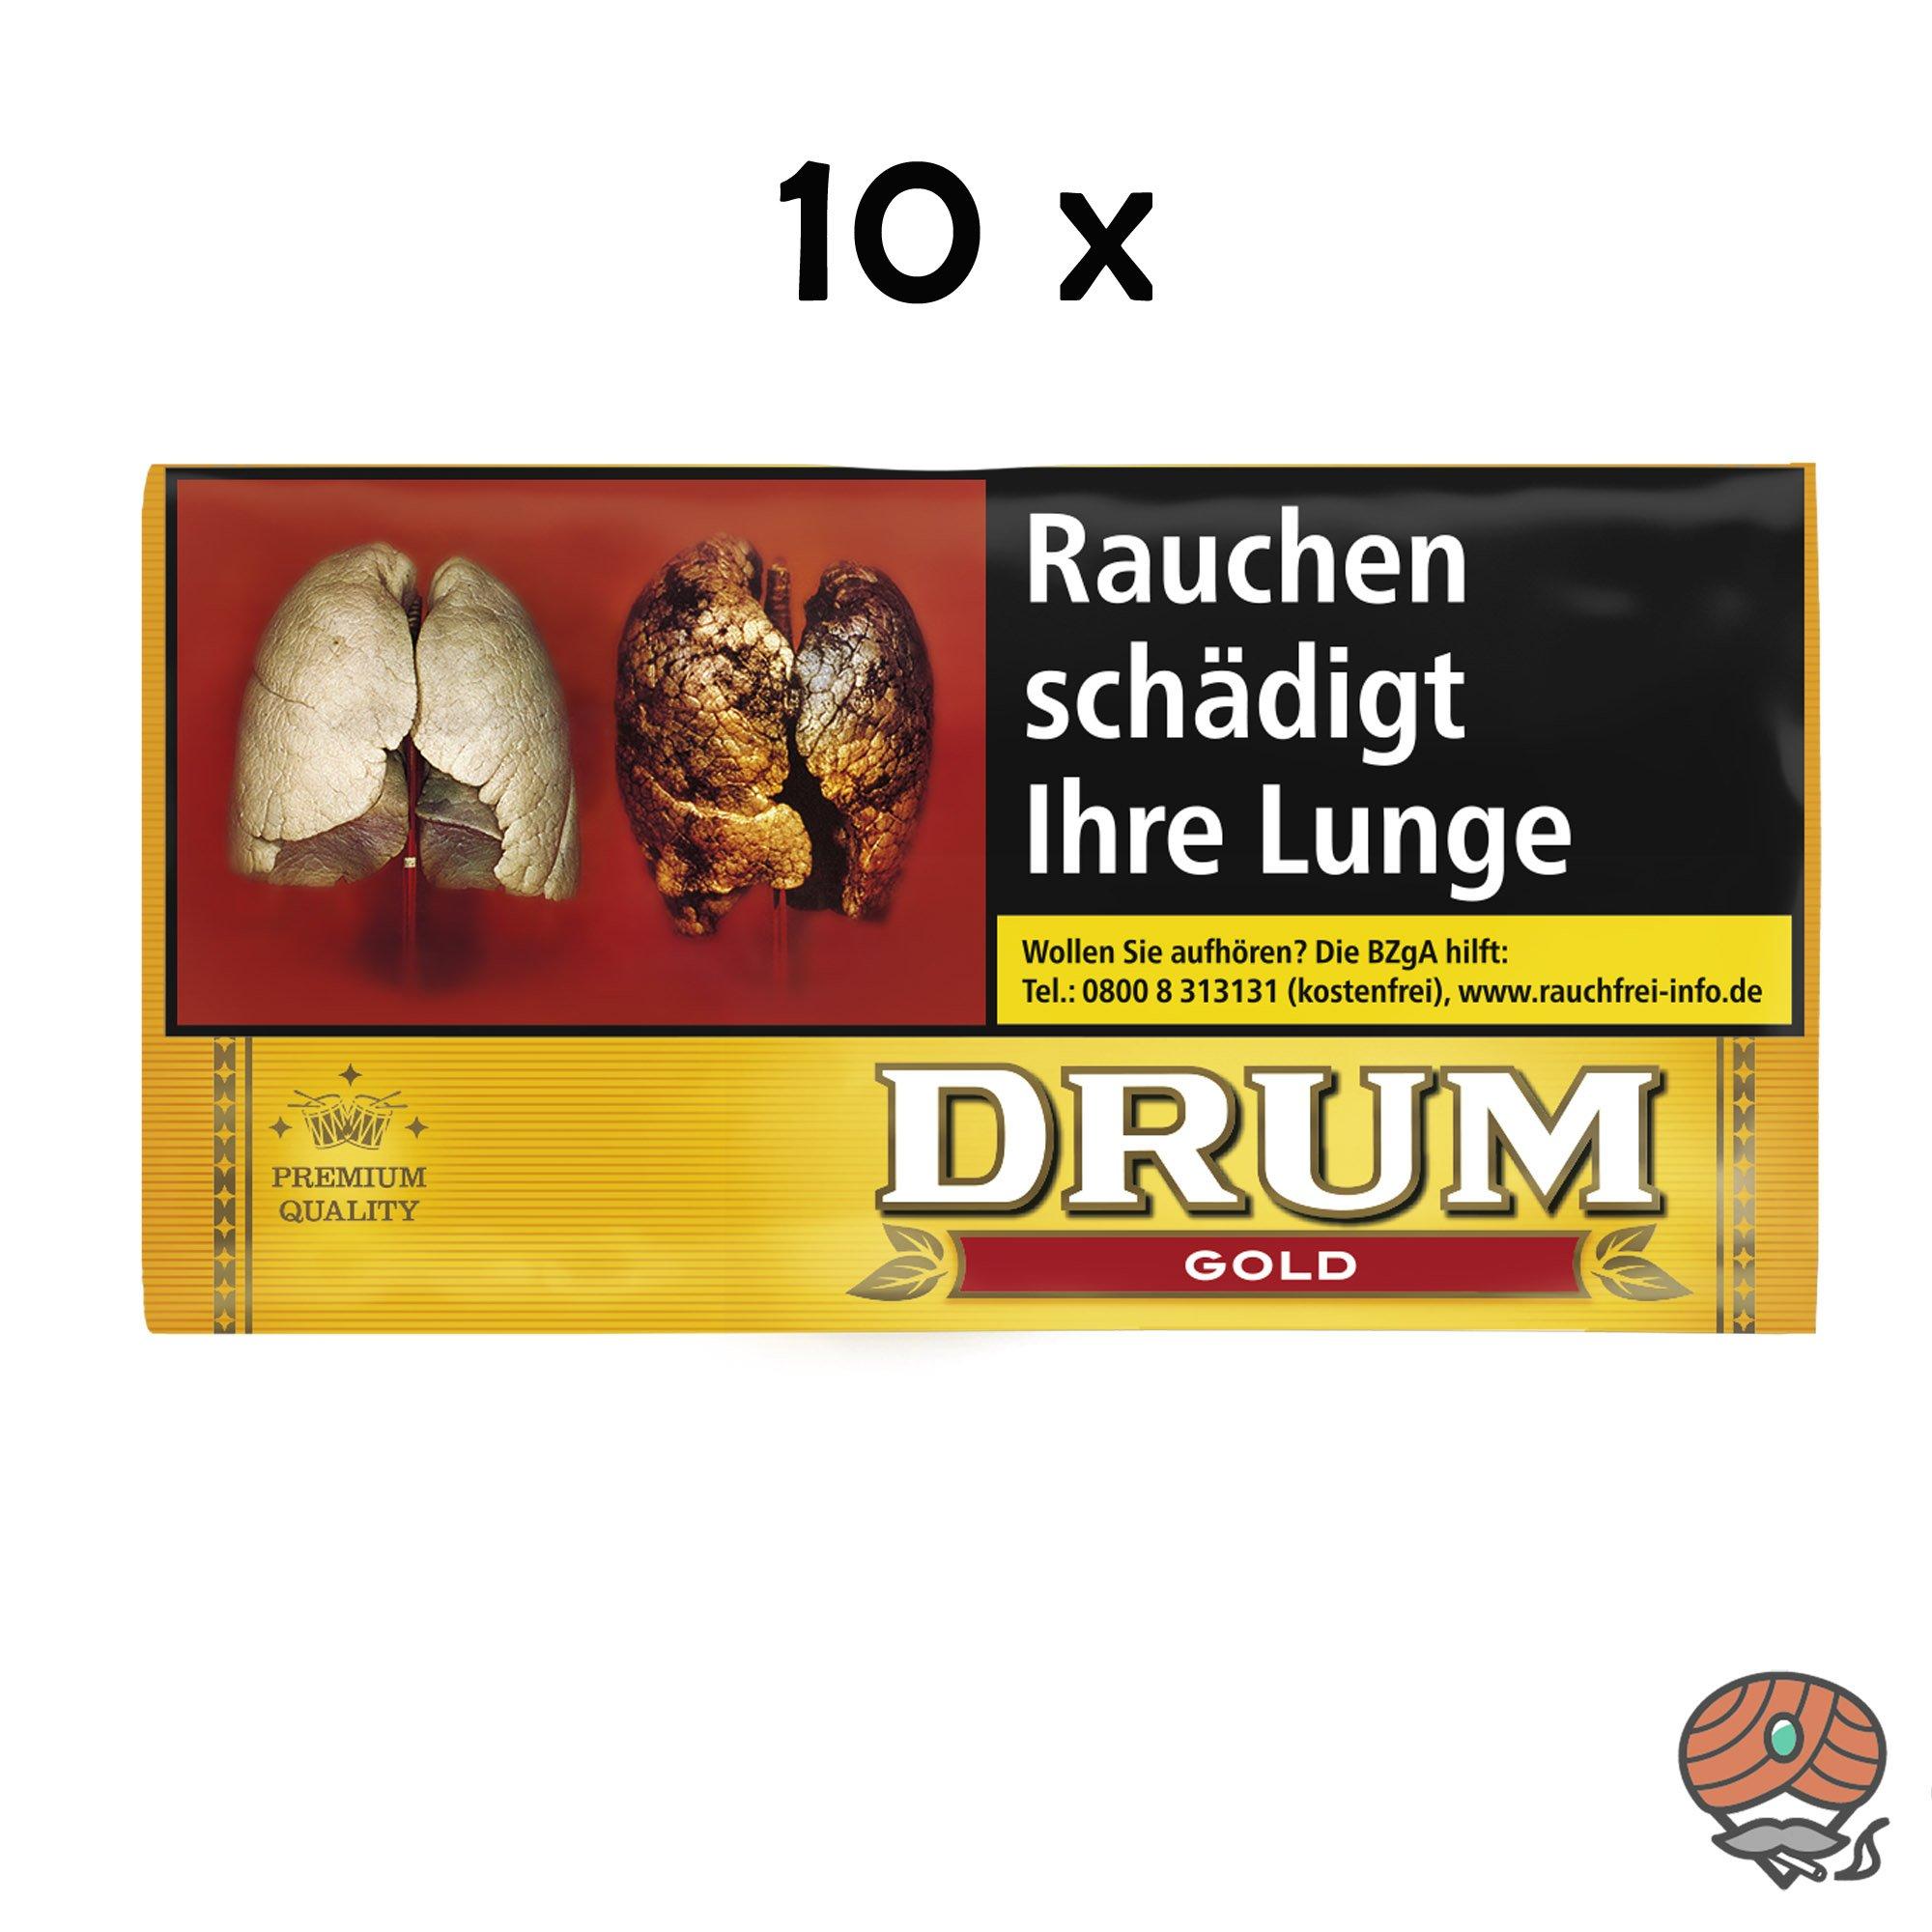 10 x Drum Gold / Yellow Zigarettentabak / Drehtabak 30 g Beutel